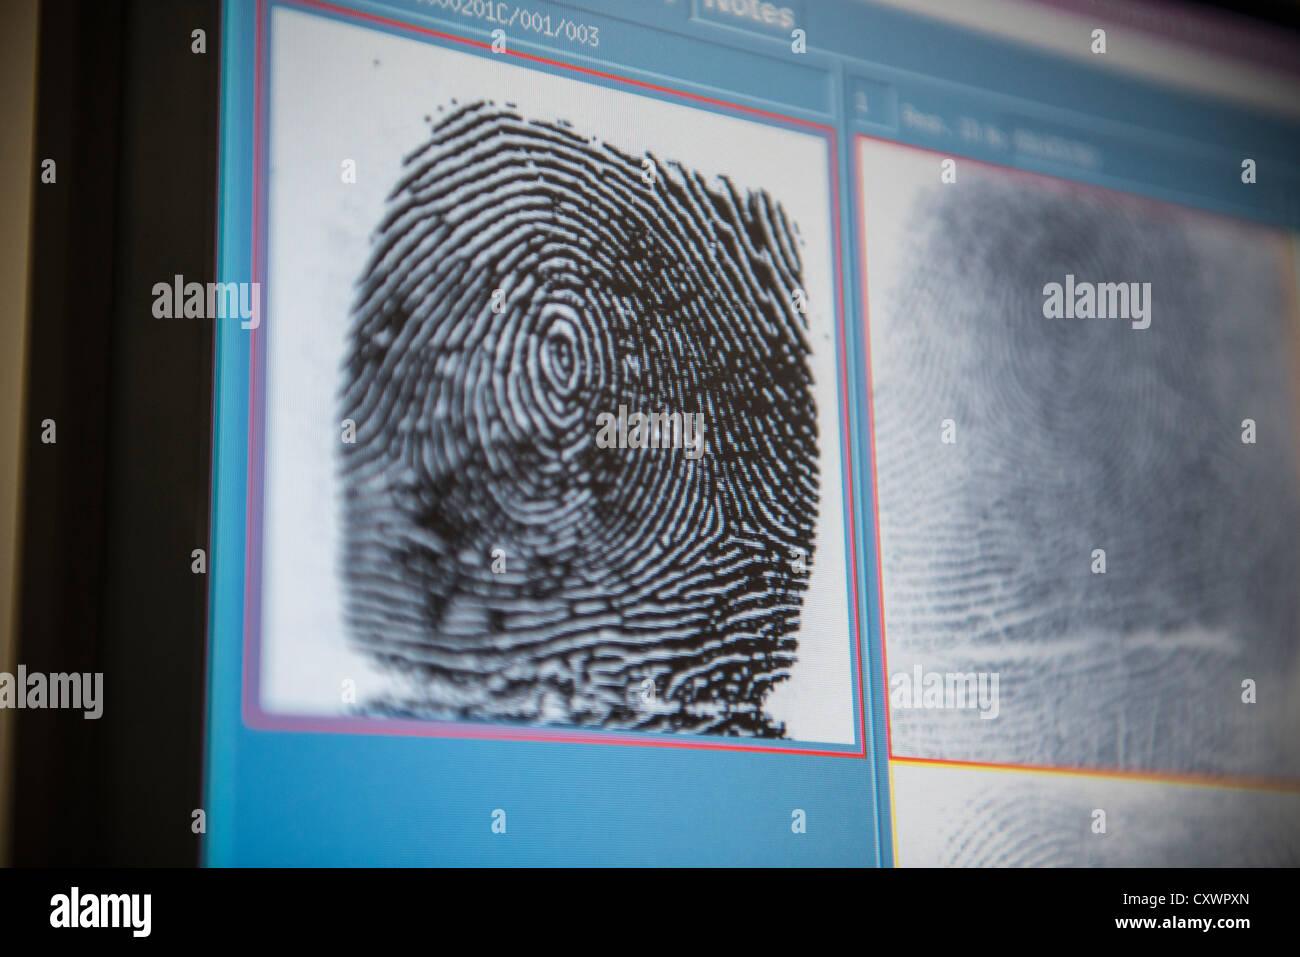 Fingerprints on screen in forensic lab - Stock Image